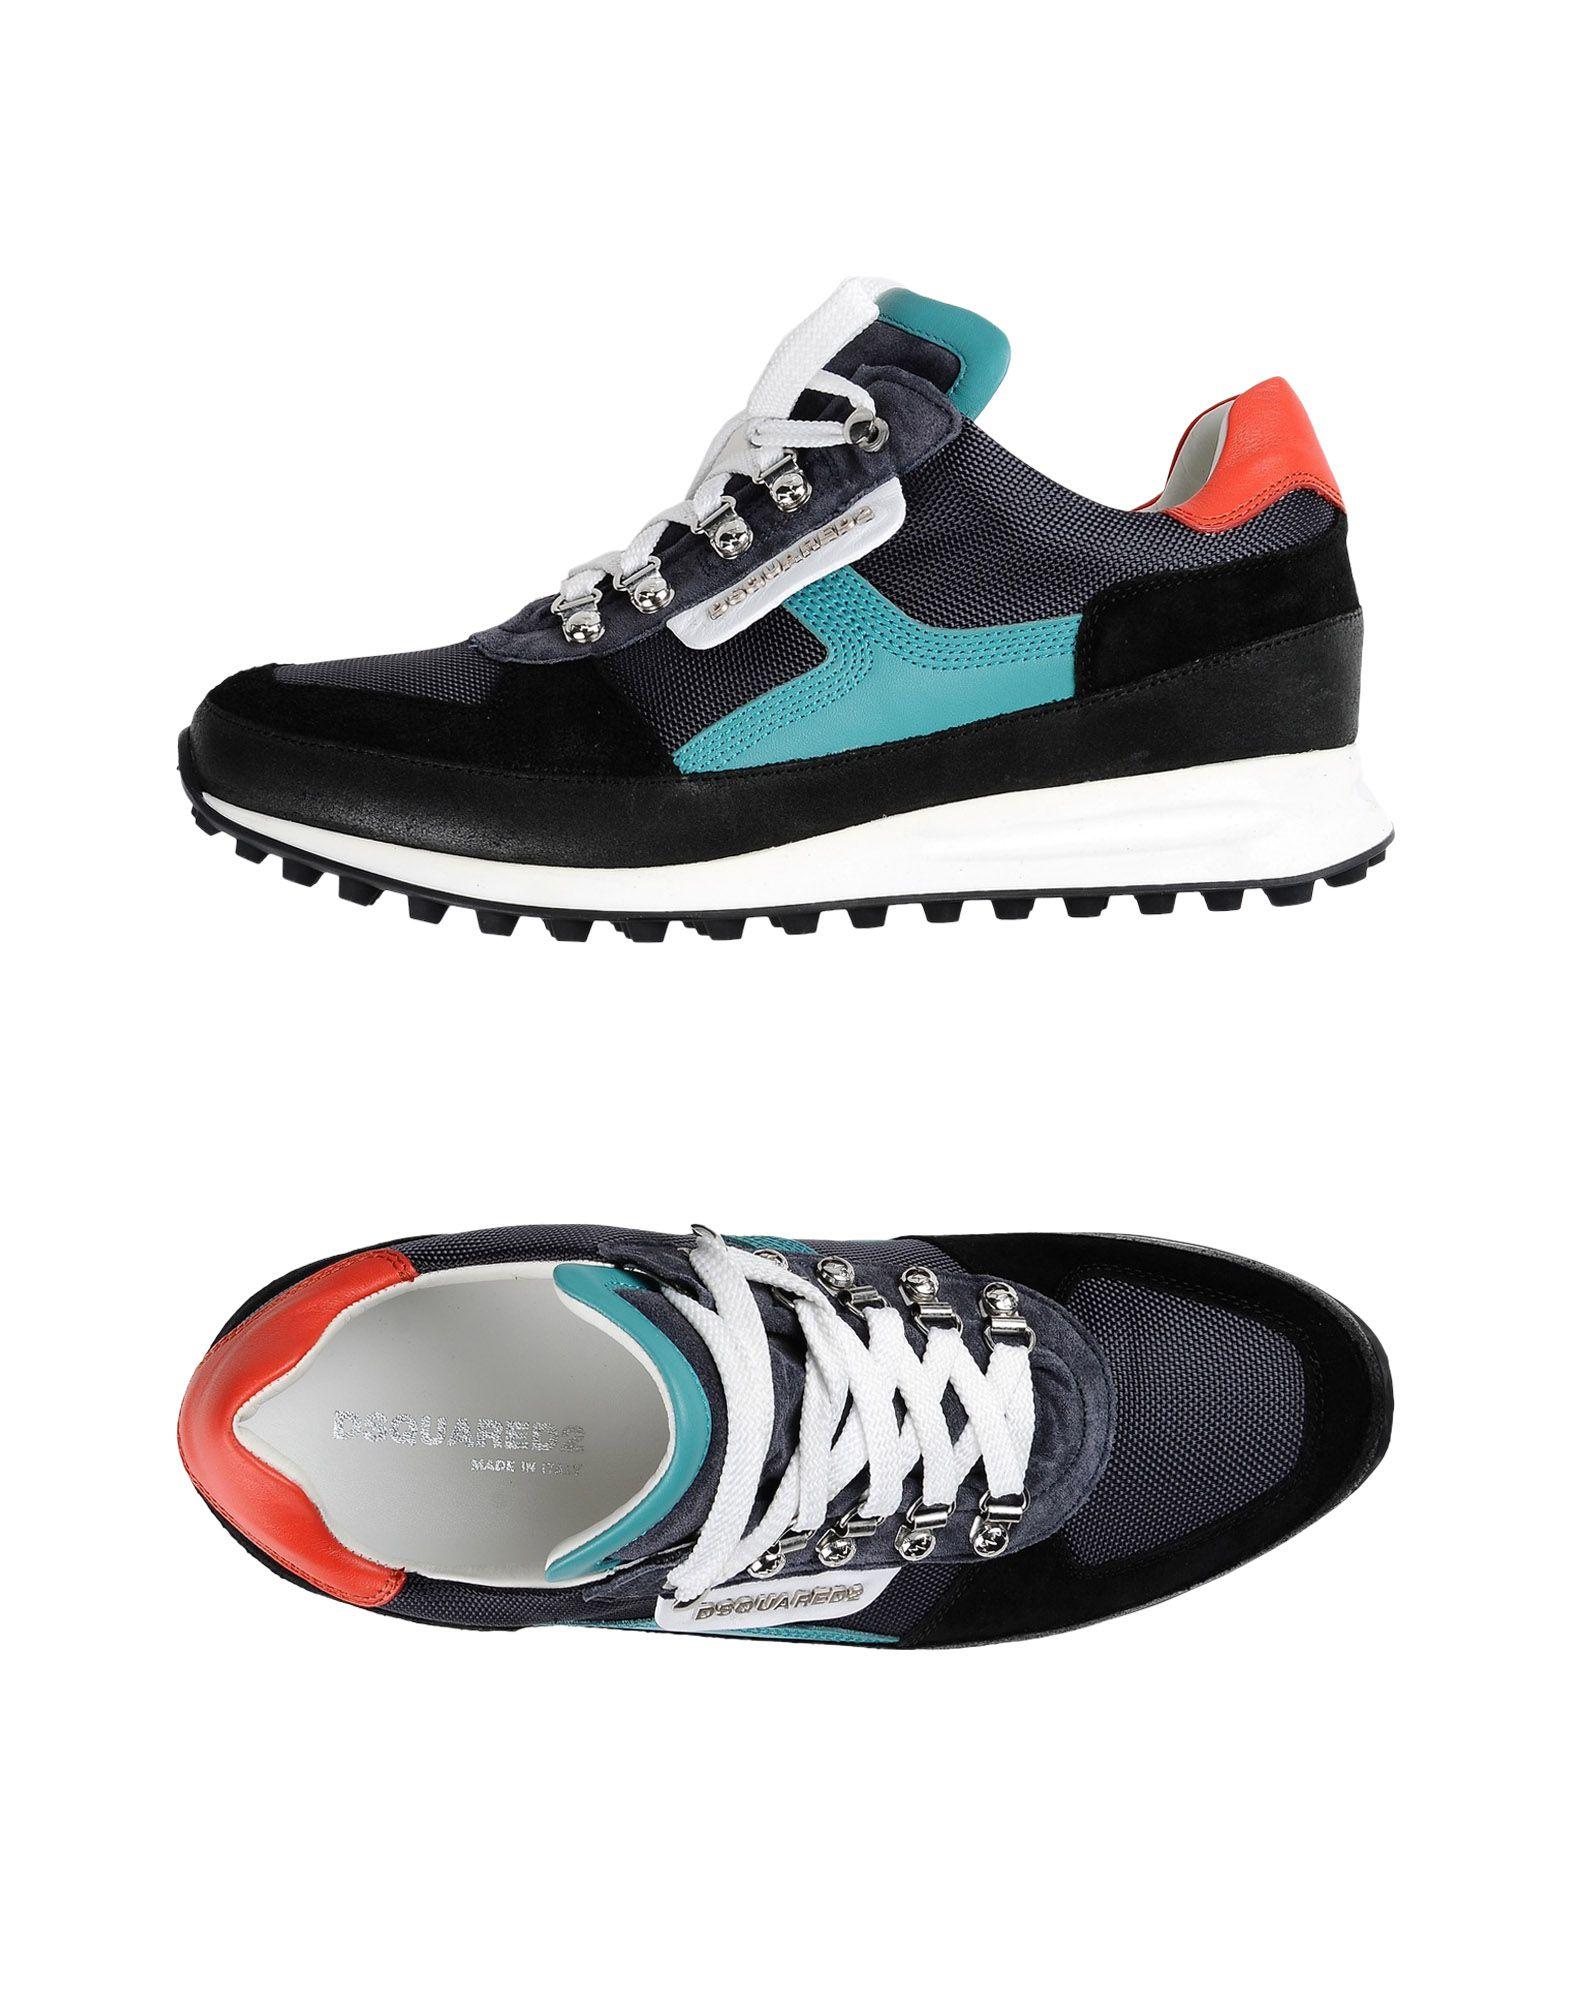 Dsquared2 Gute Sneakers Herren  11411490RD Gute Dsquared2 Qualität beliebte Schuhe 72a05f